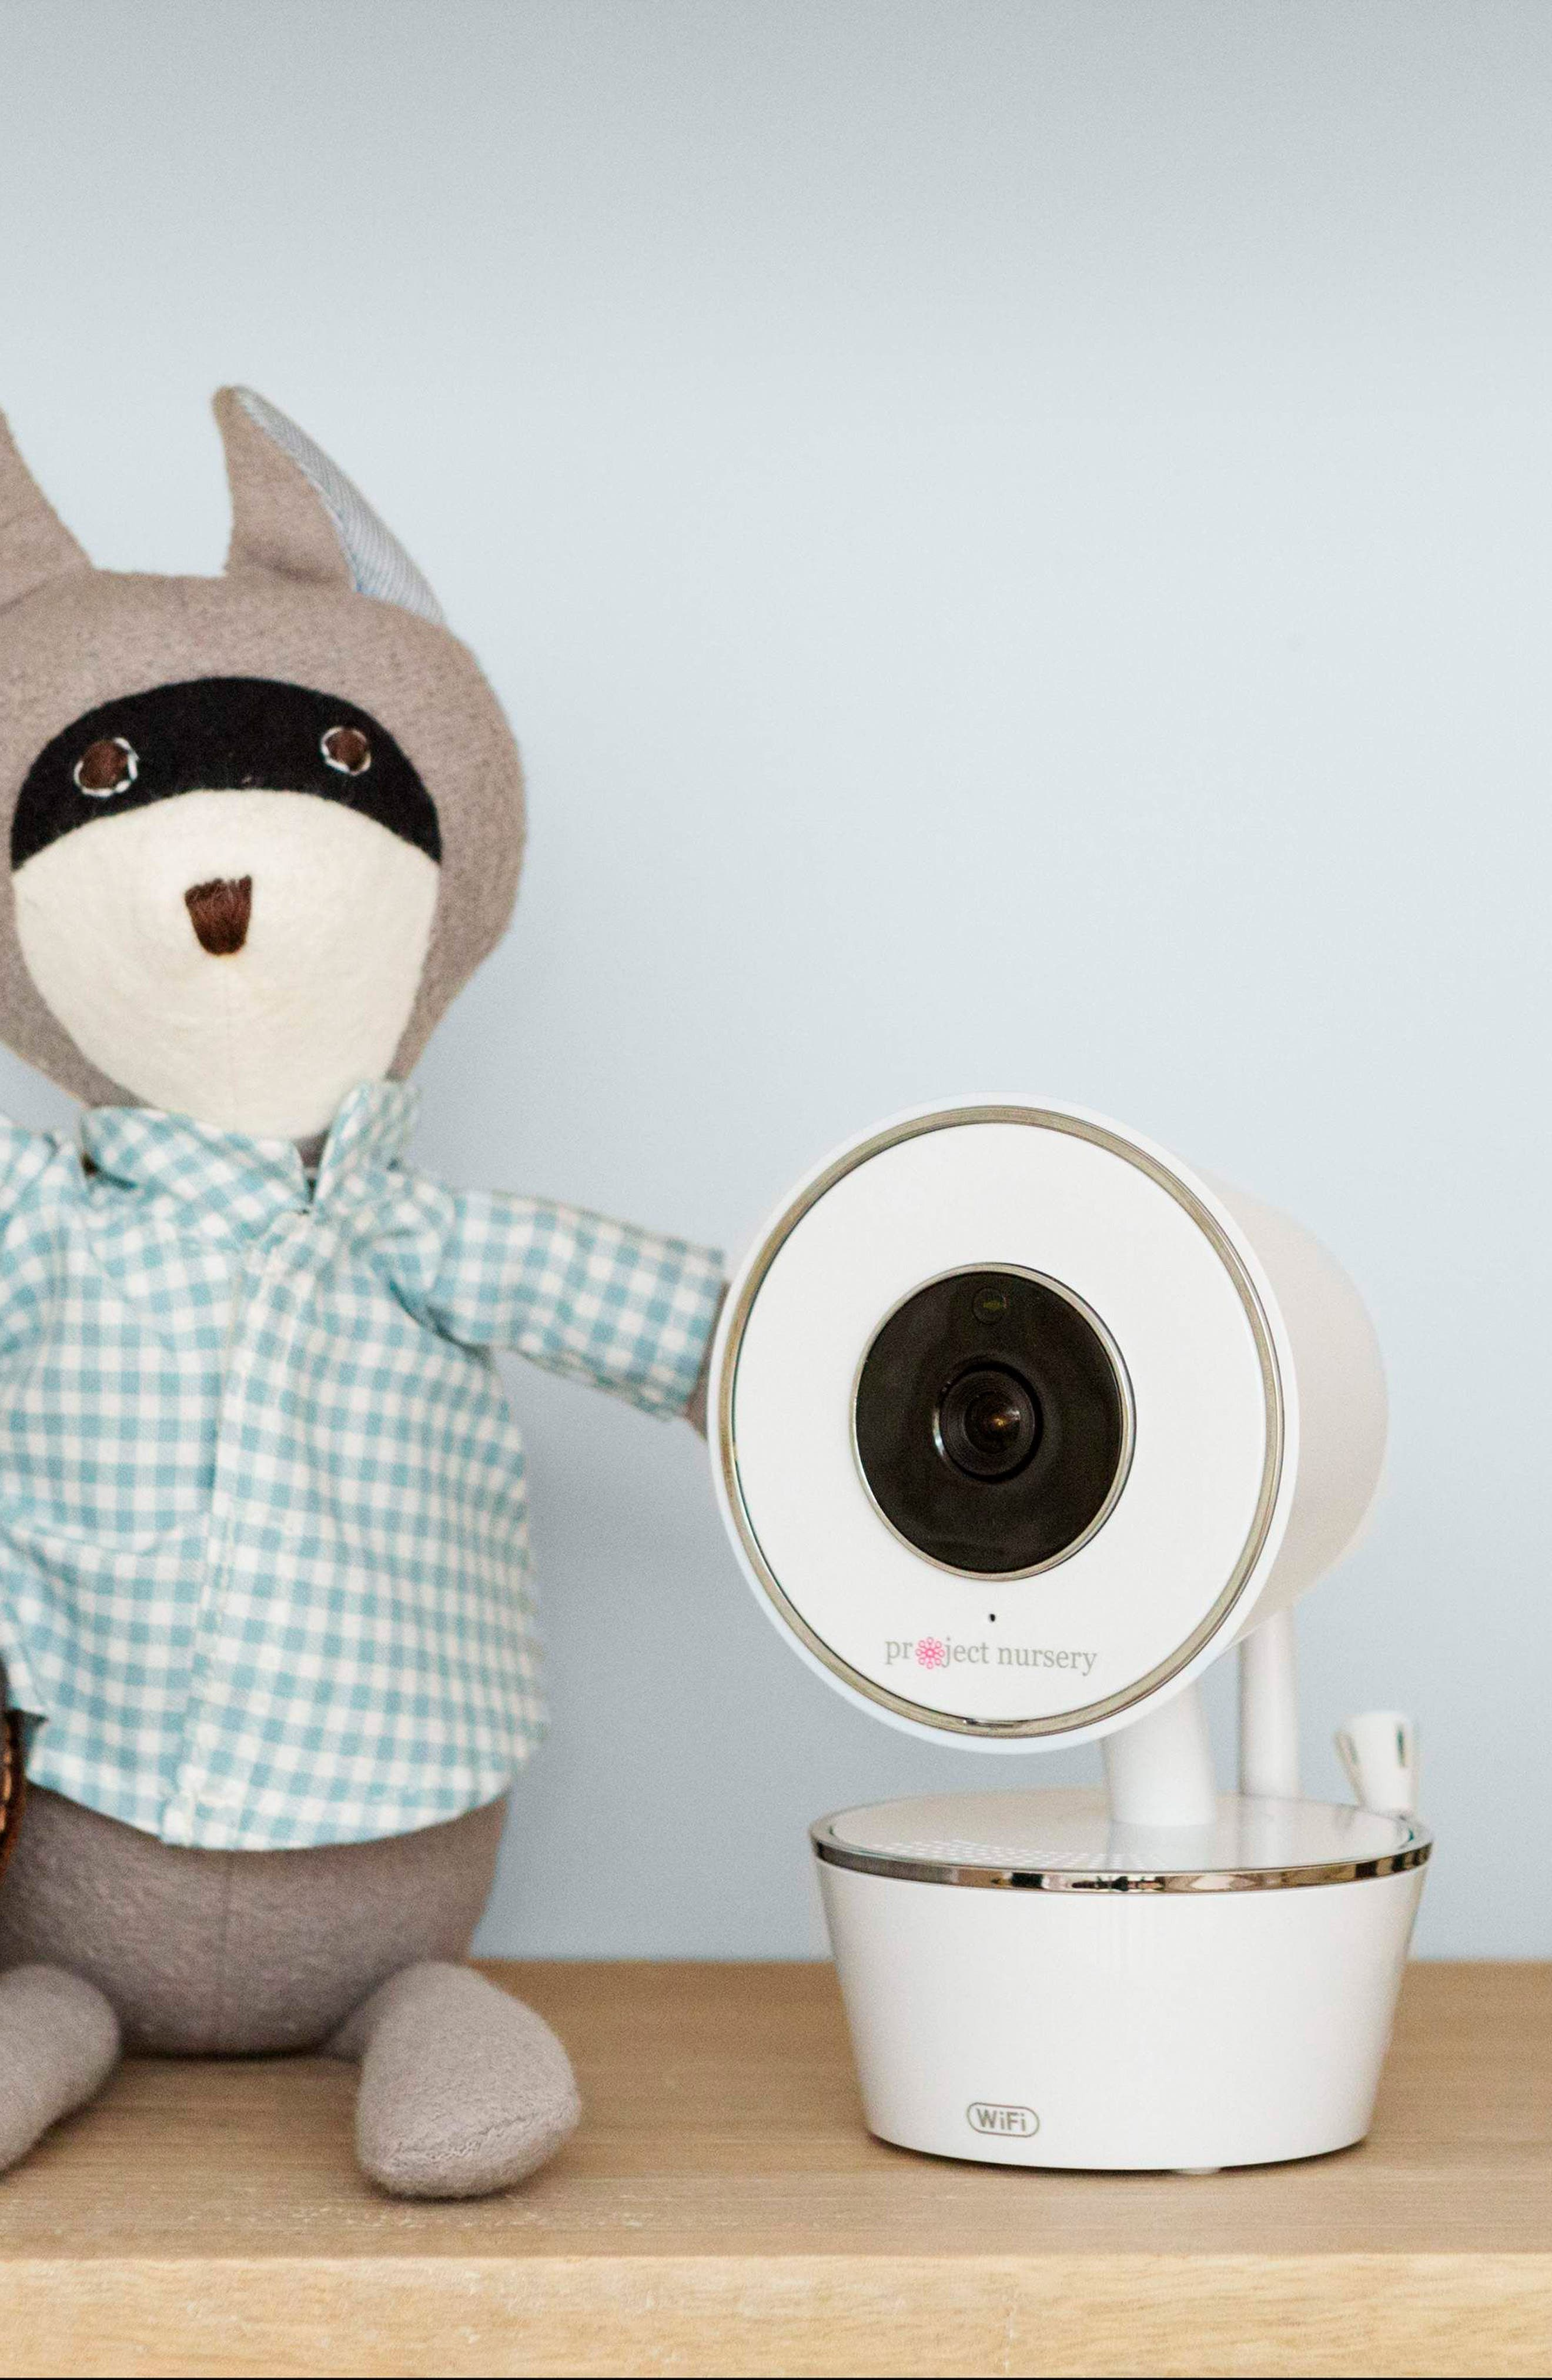 Smart Nursery Wi-Fi Baby Monitor,                             Alternate thumbnail 7, color,                             WHITE